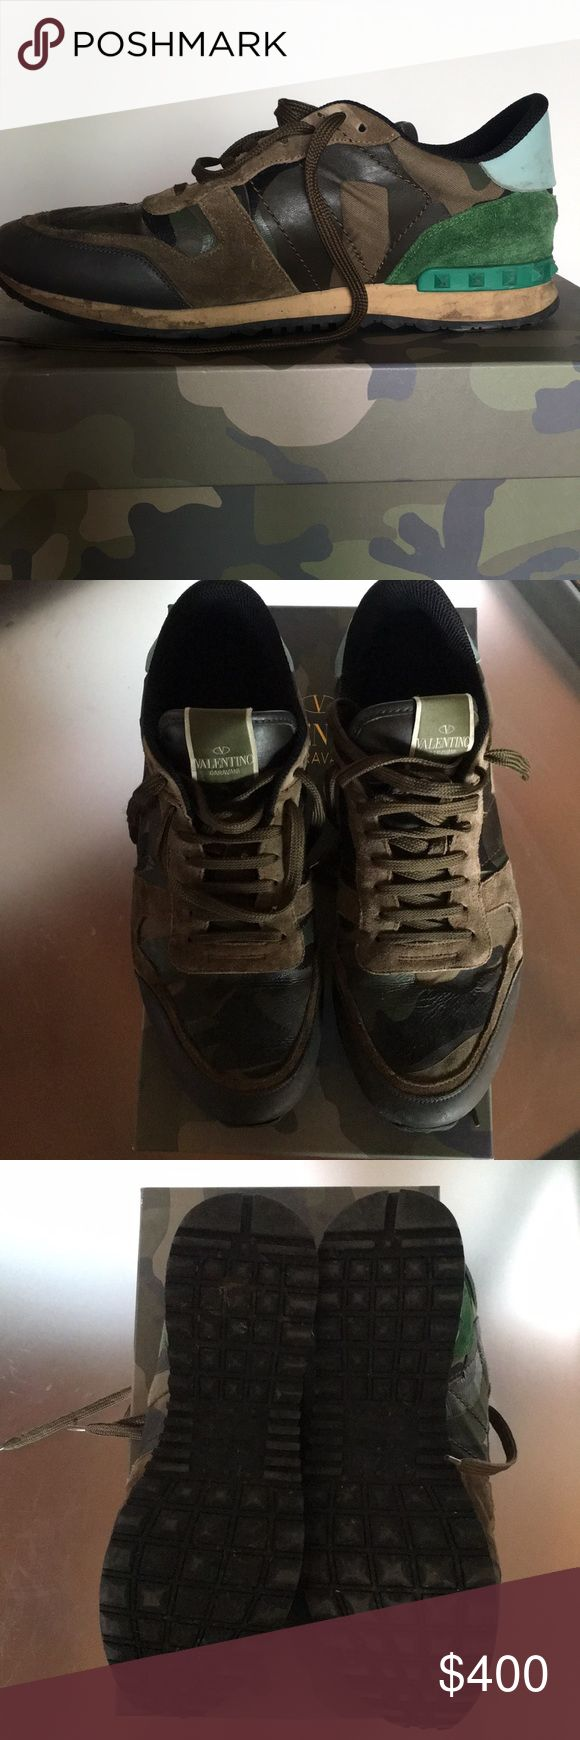 Valentino garavani mens shoes Great condition! Valentino Garavani Shoes Sneakers